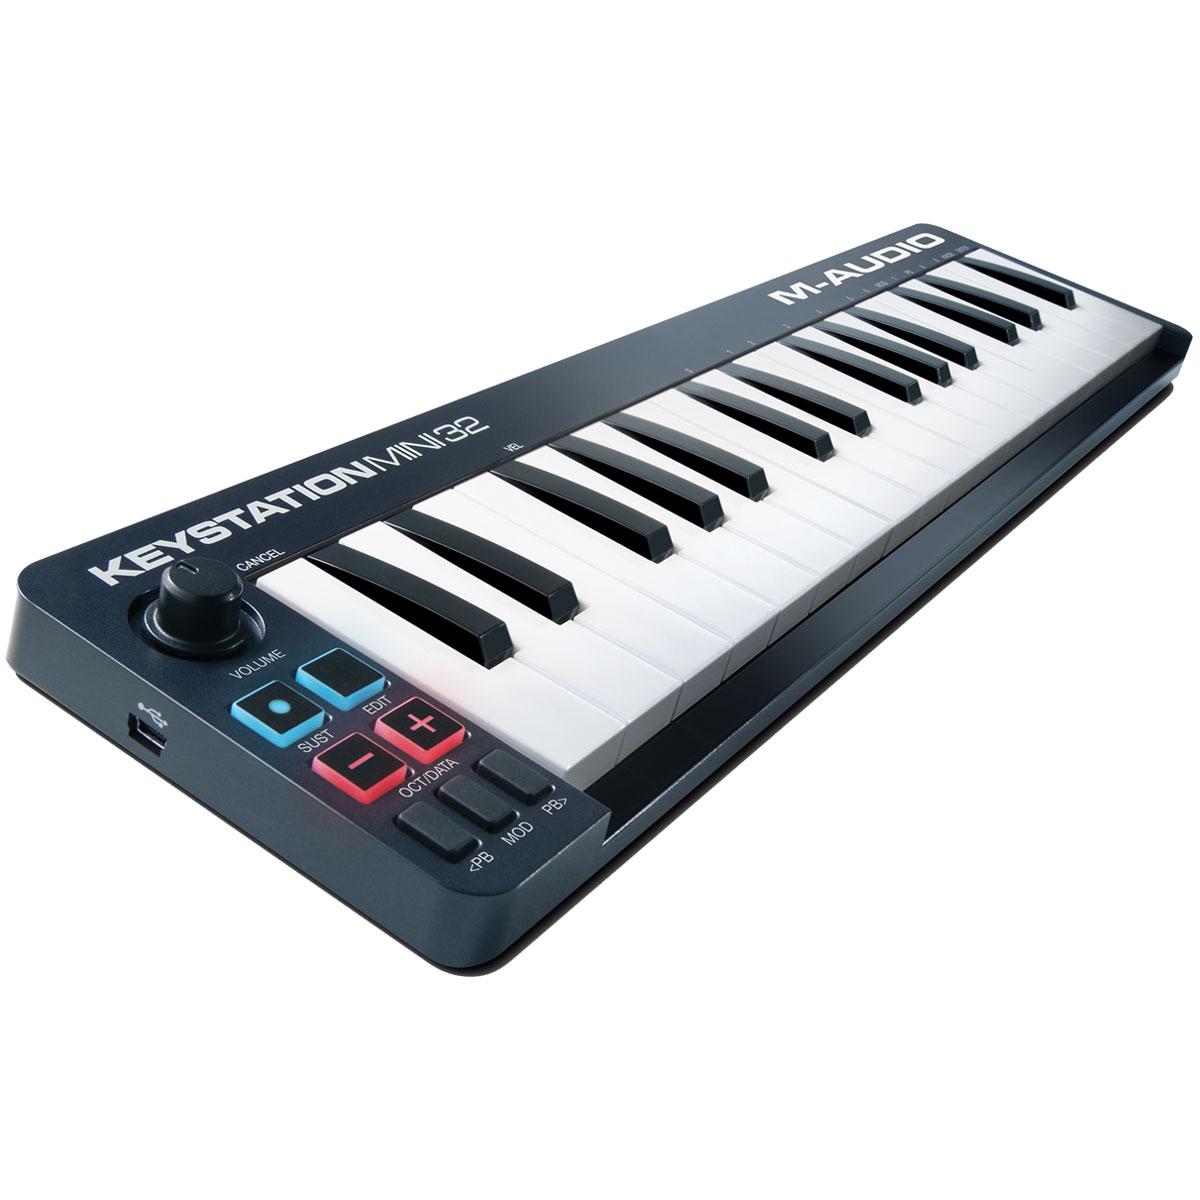 m audio keystation mini 32 mkii clavier home studio m. Black Bedroom Furniture Sets. Home Design Ideas